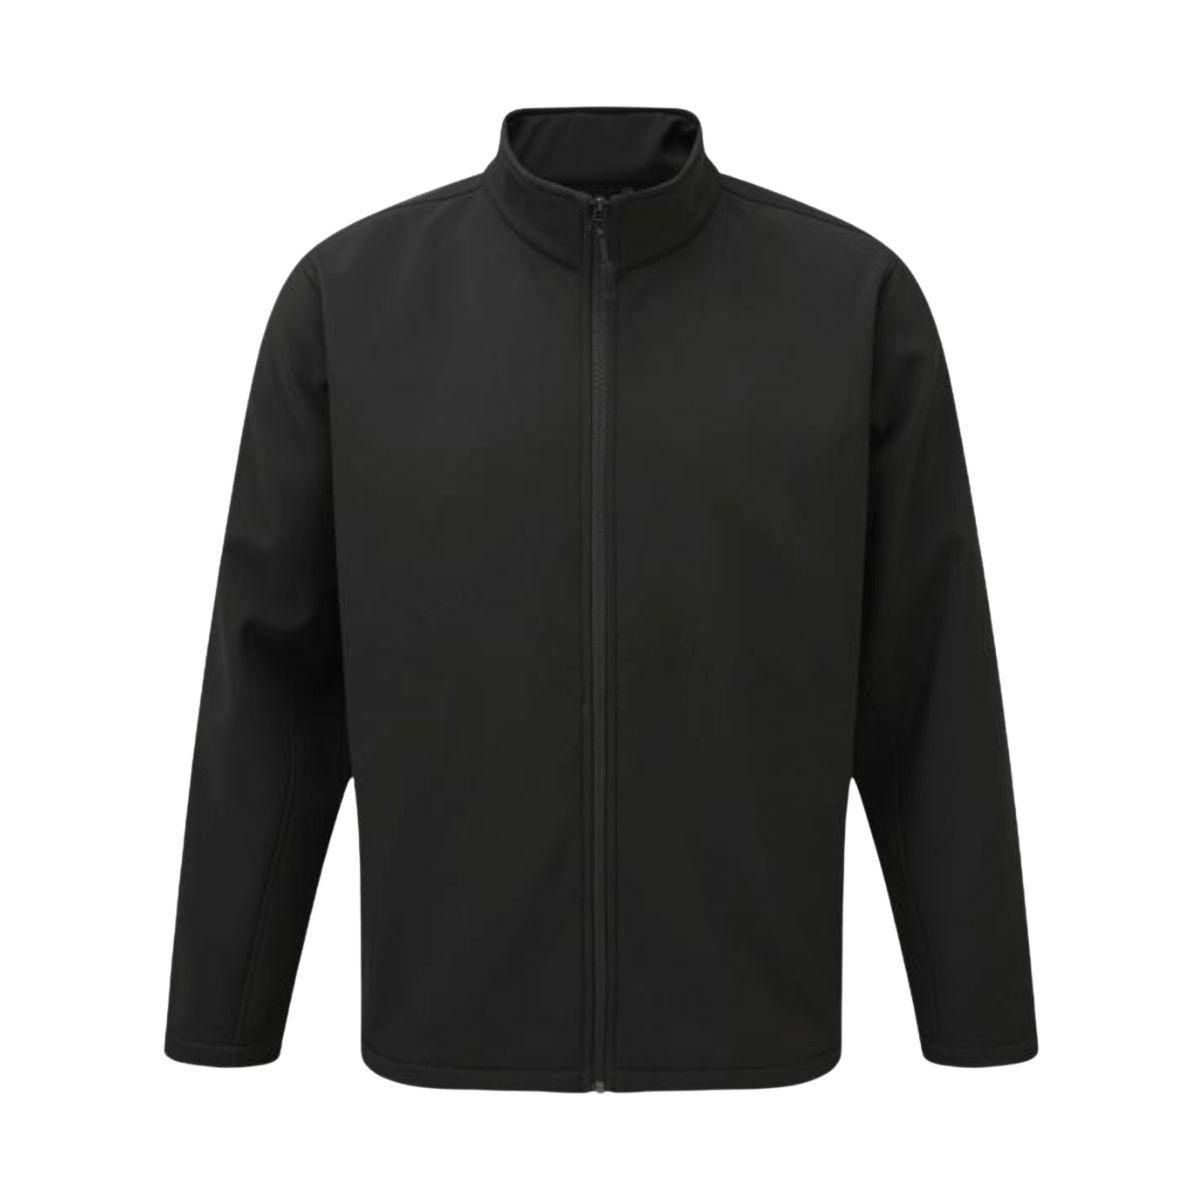 JK9612 Classic Full Zip Softshell Jacket